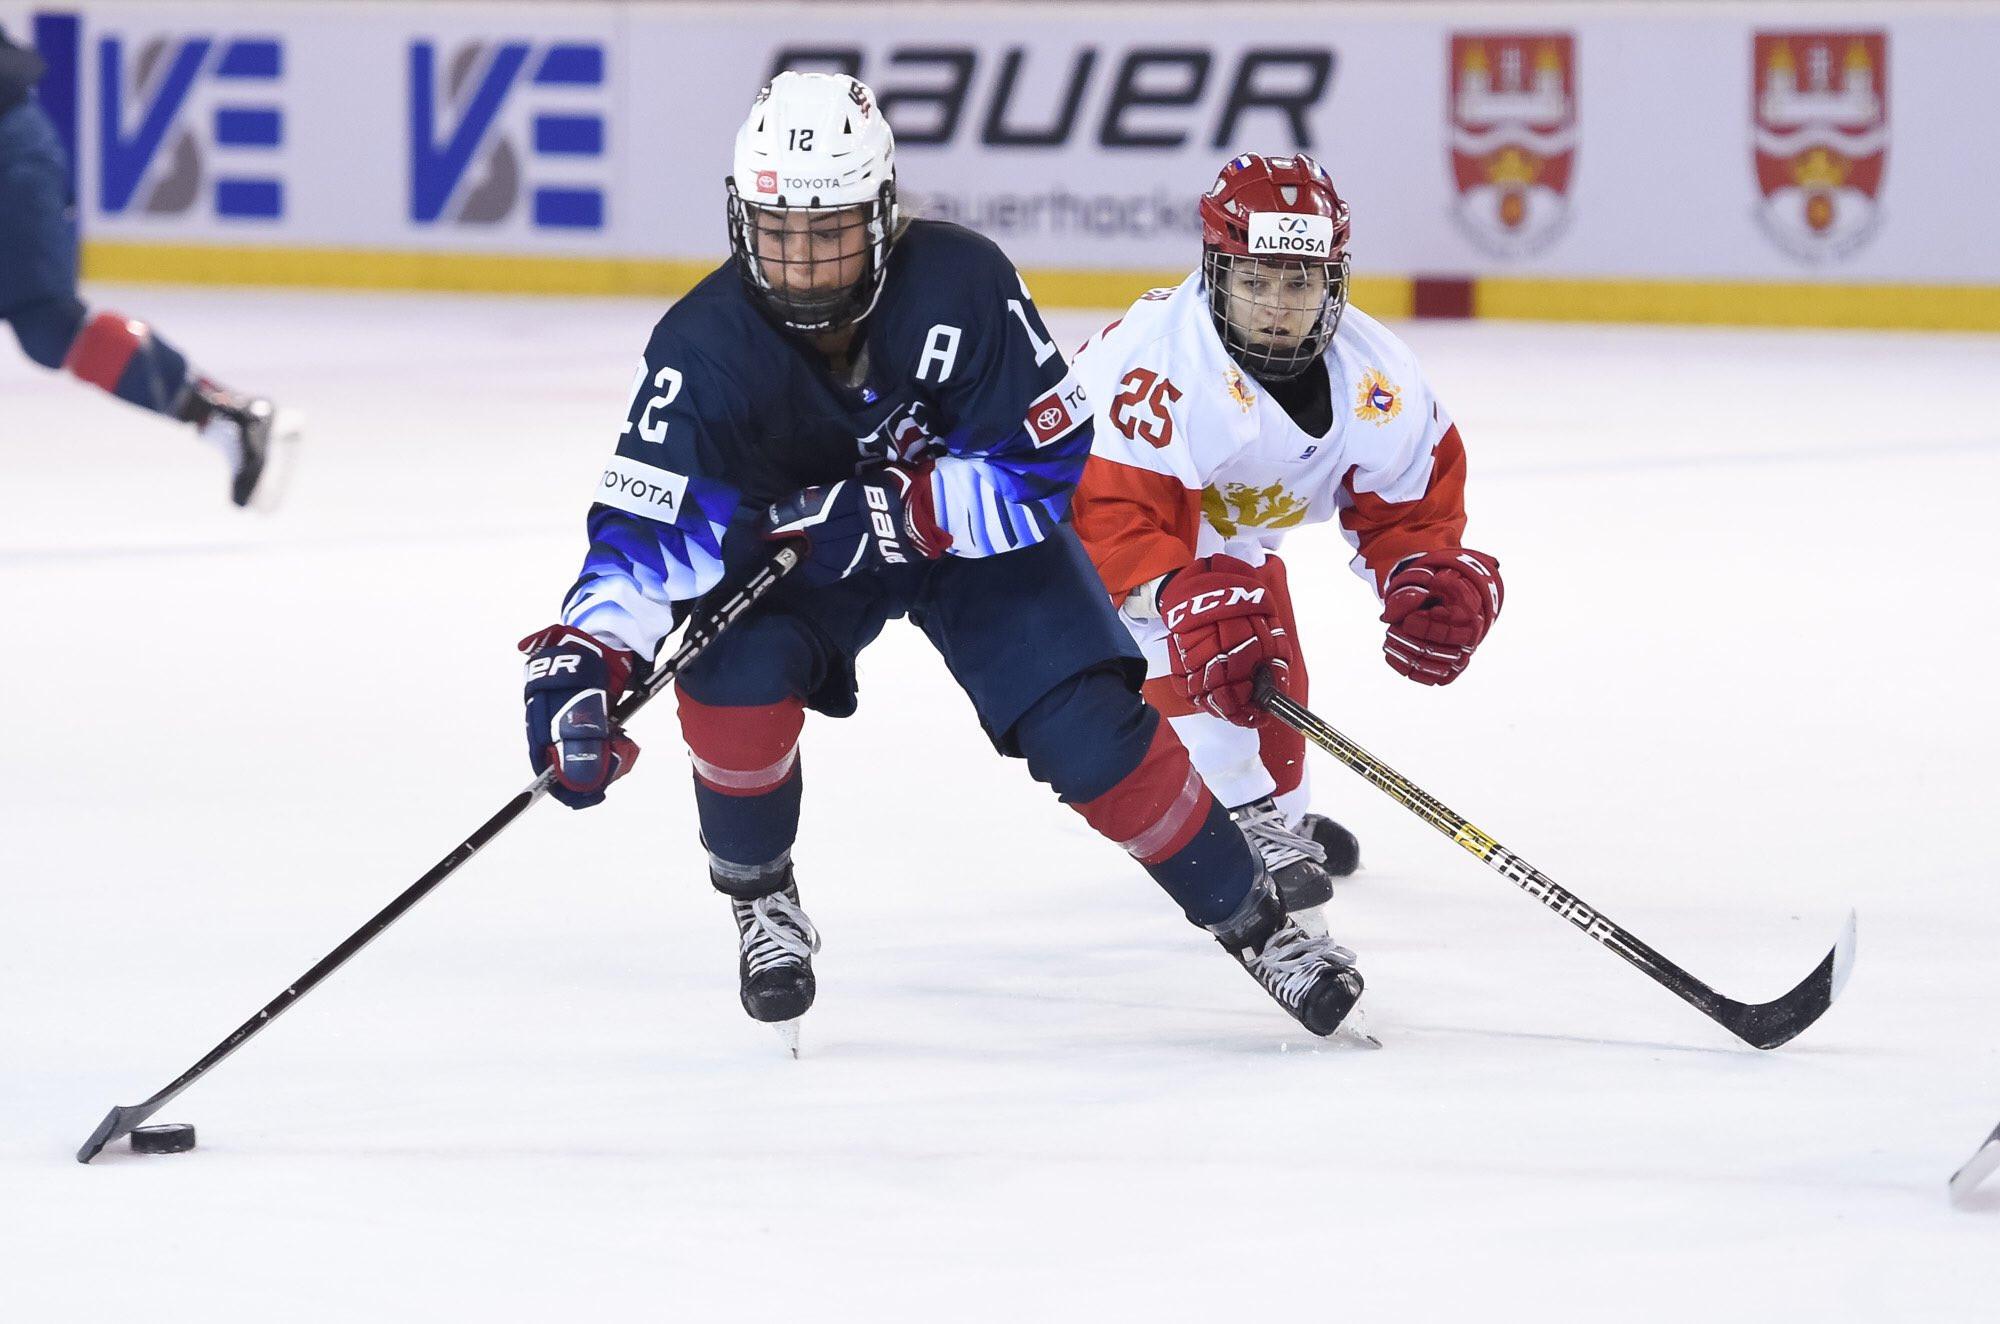 The United States overcame Russia to reach the IIHF World Women's Under-18 Women's Championship final ©IIHF